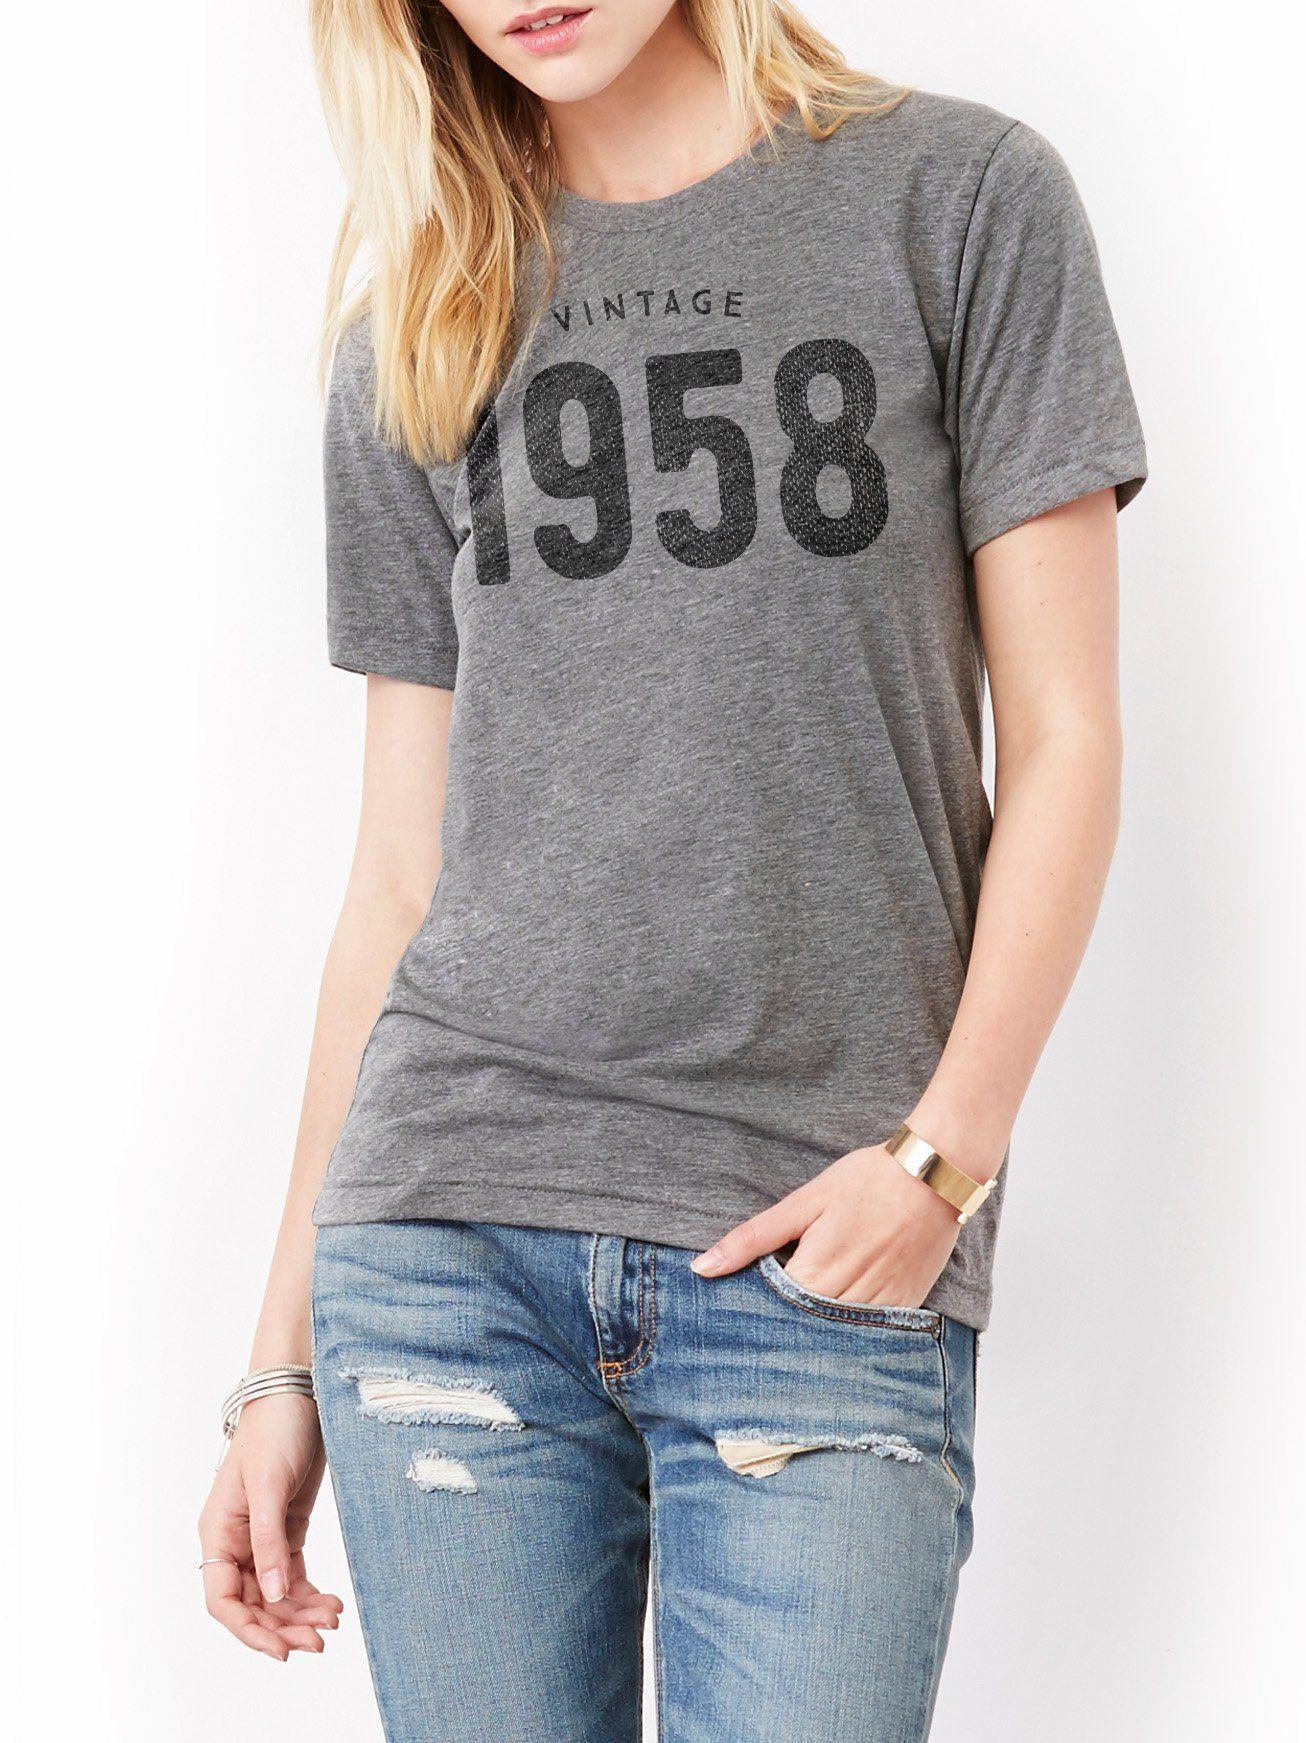 Vintage 1958 T Shirt